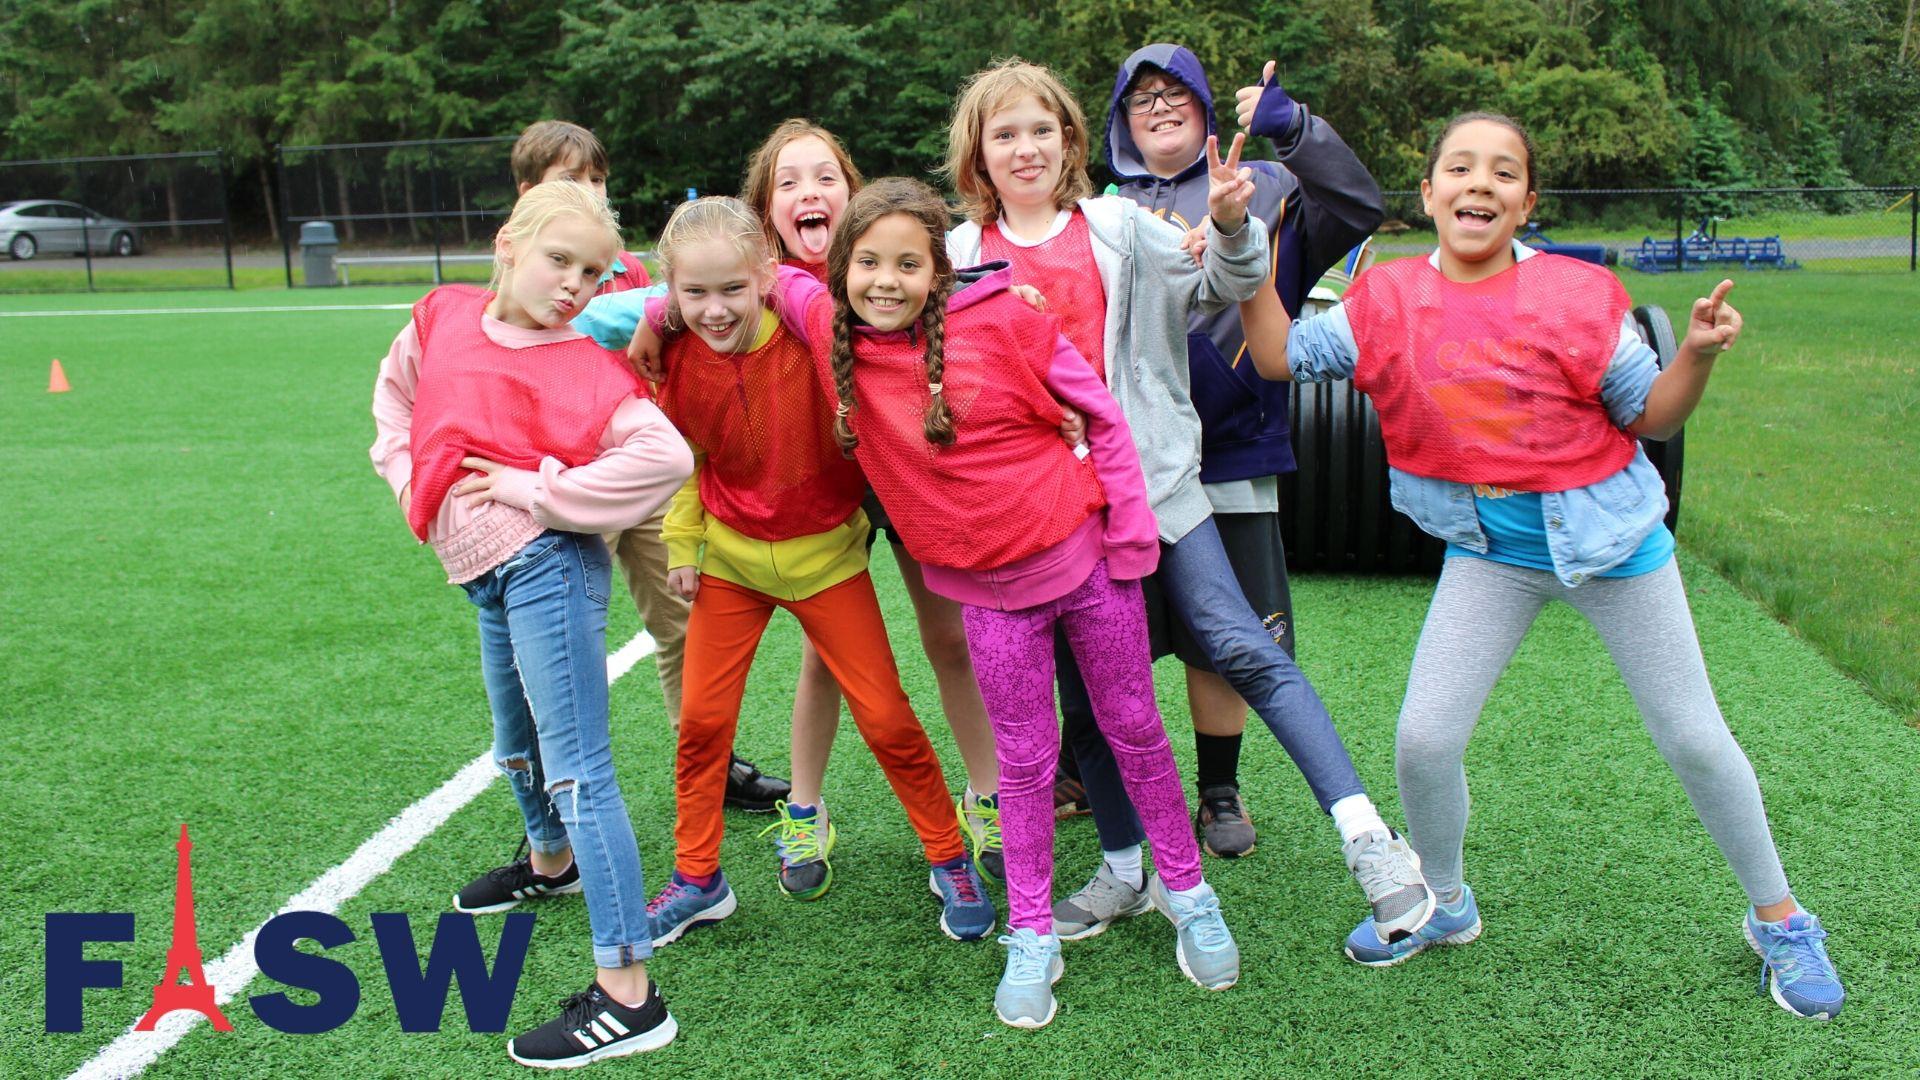 FISW 5th graders are happy in Sambica